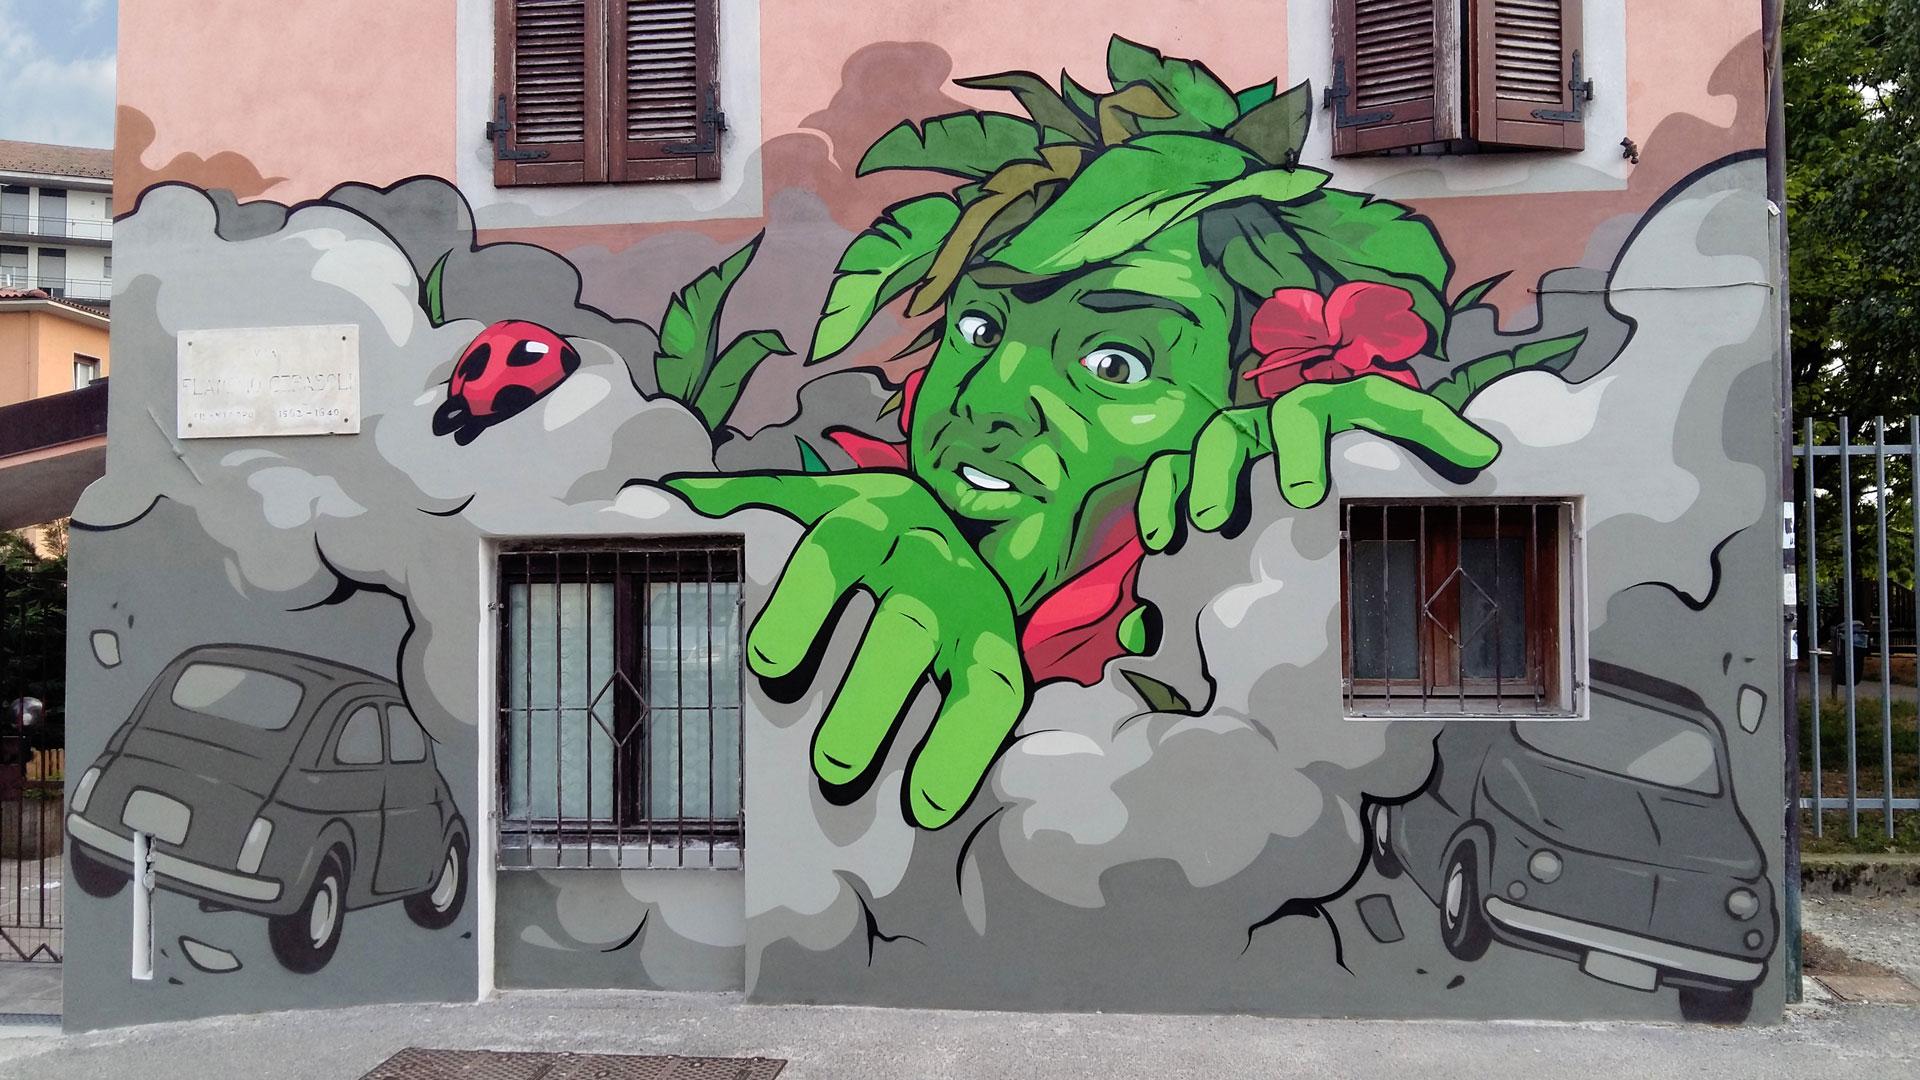 Pan,-Bergamo-(BG)-2018